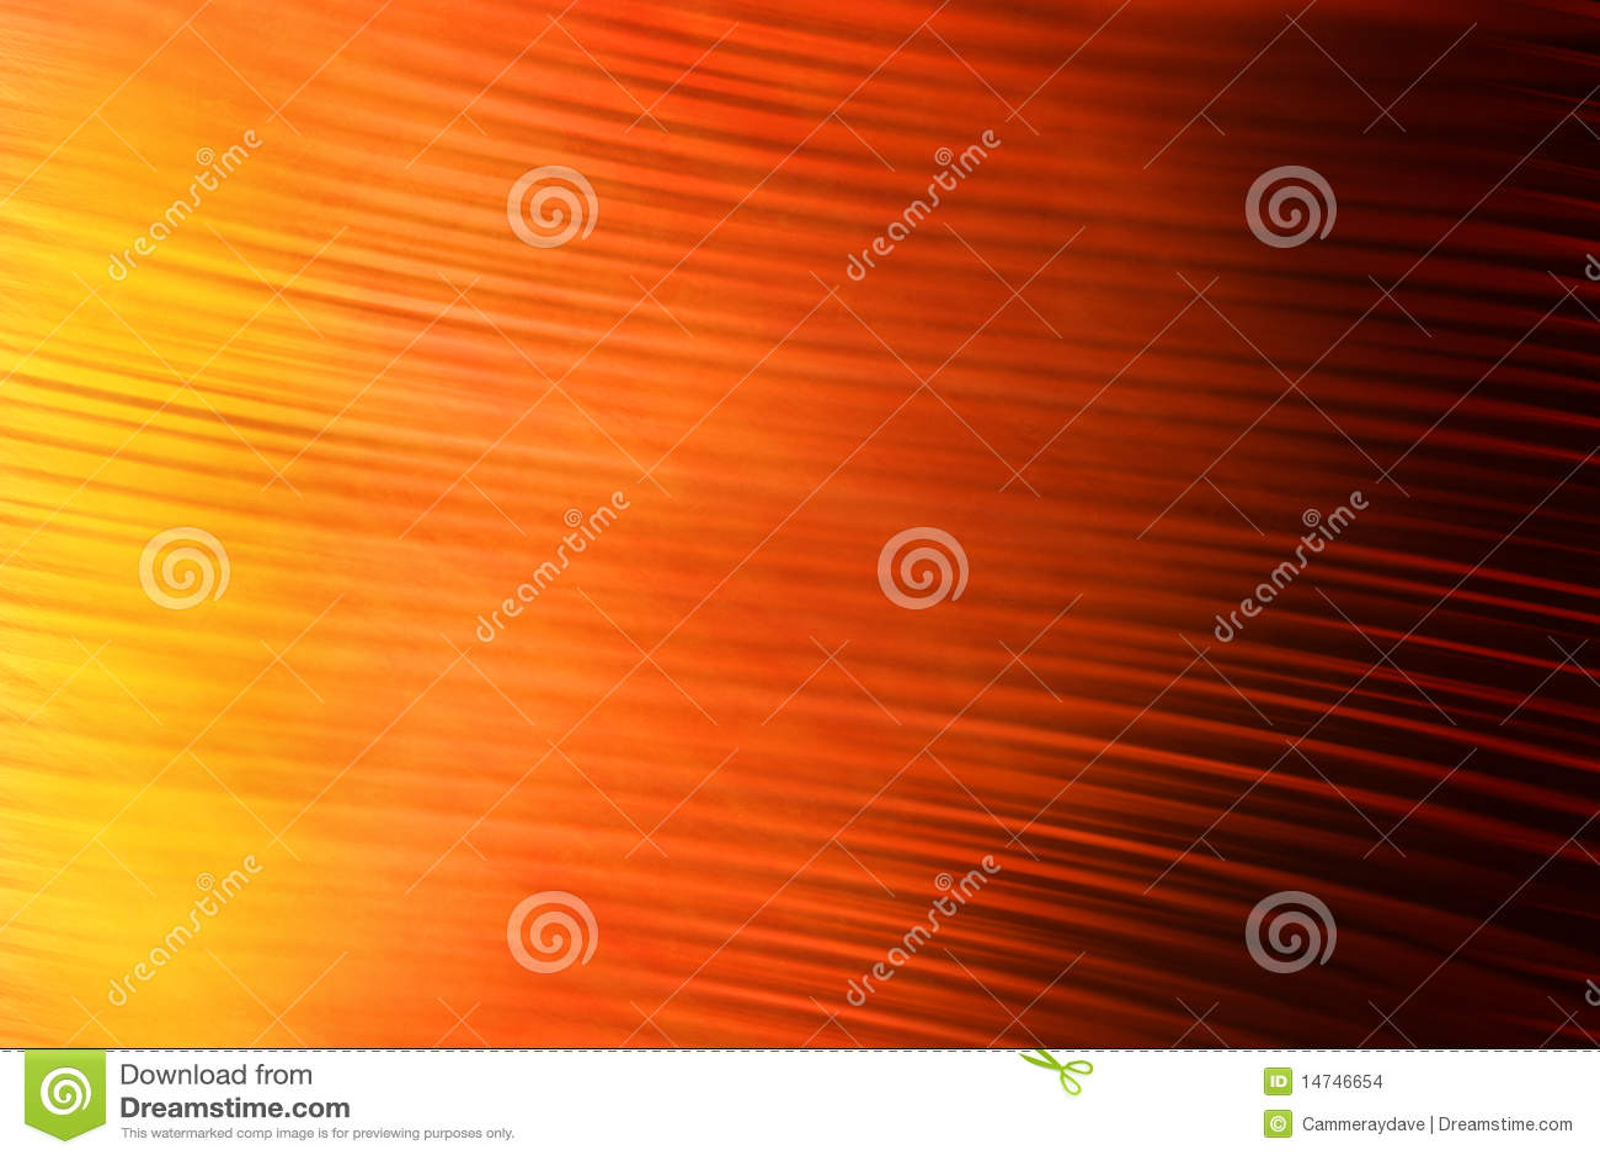 Abstract Warm Blur Background